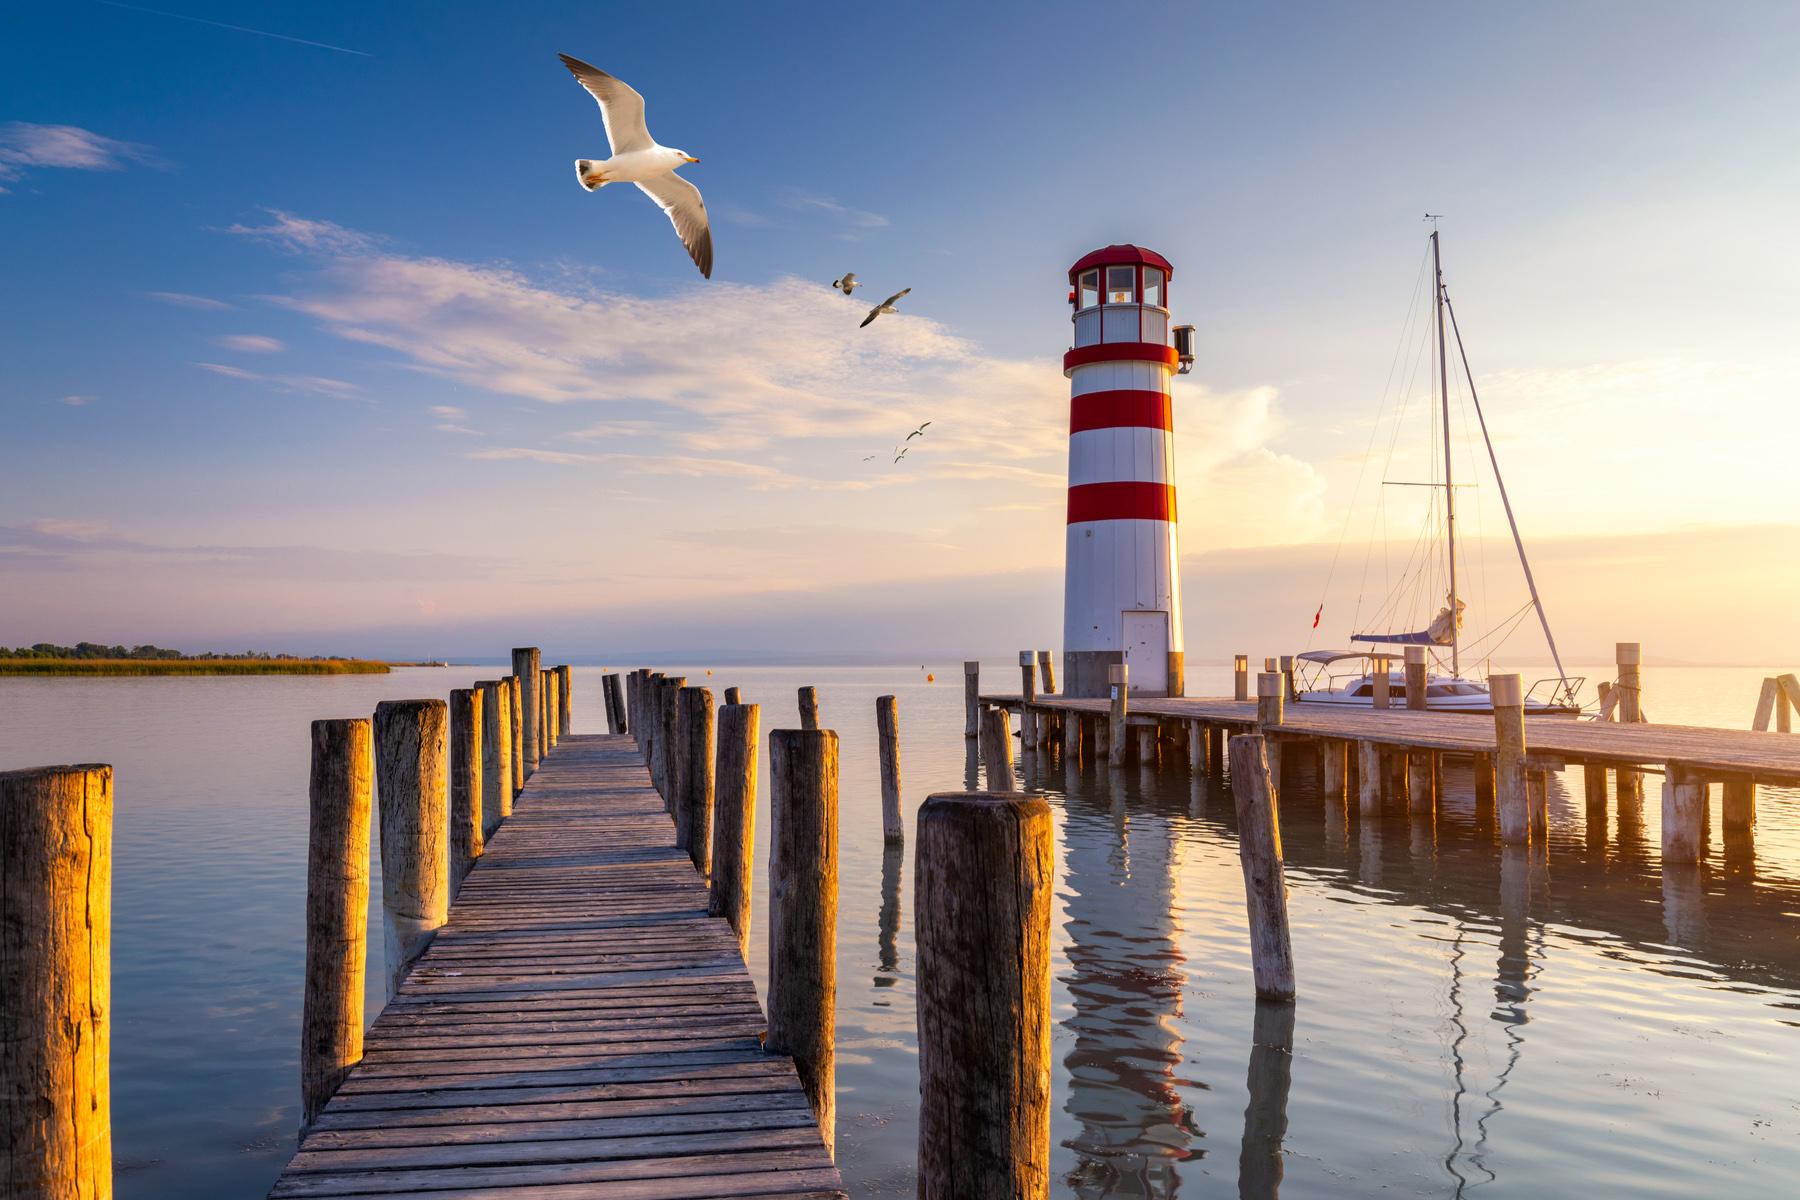 Lighthouse on Lake Neusiedl